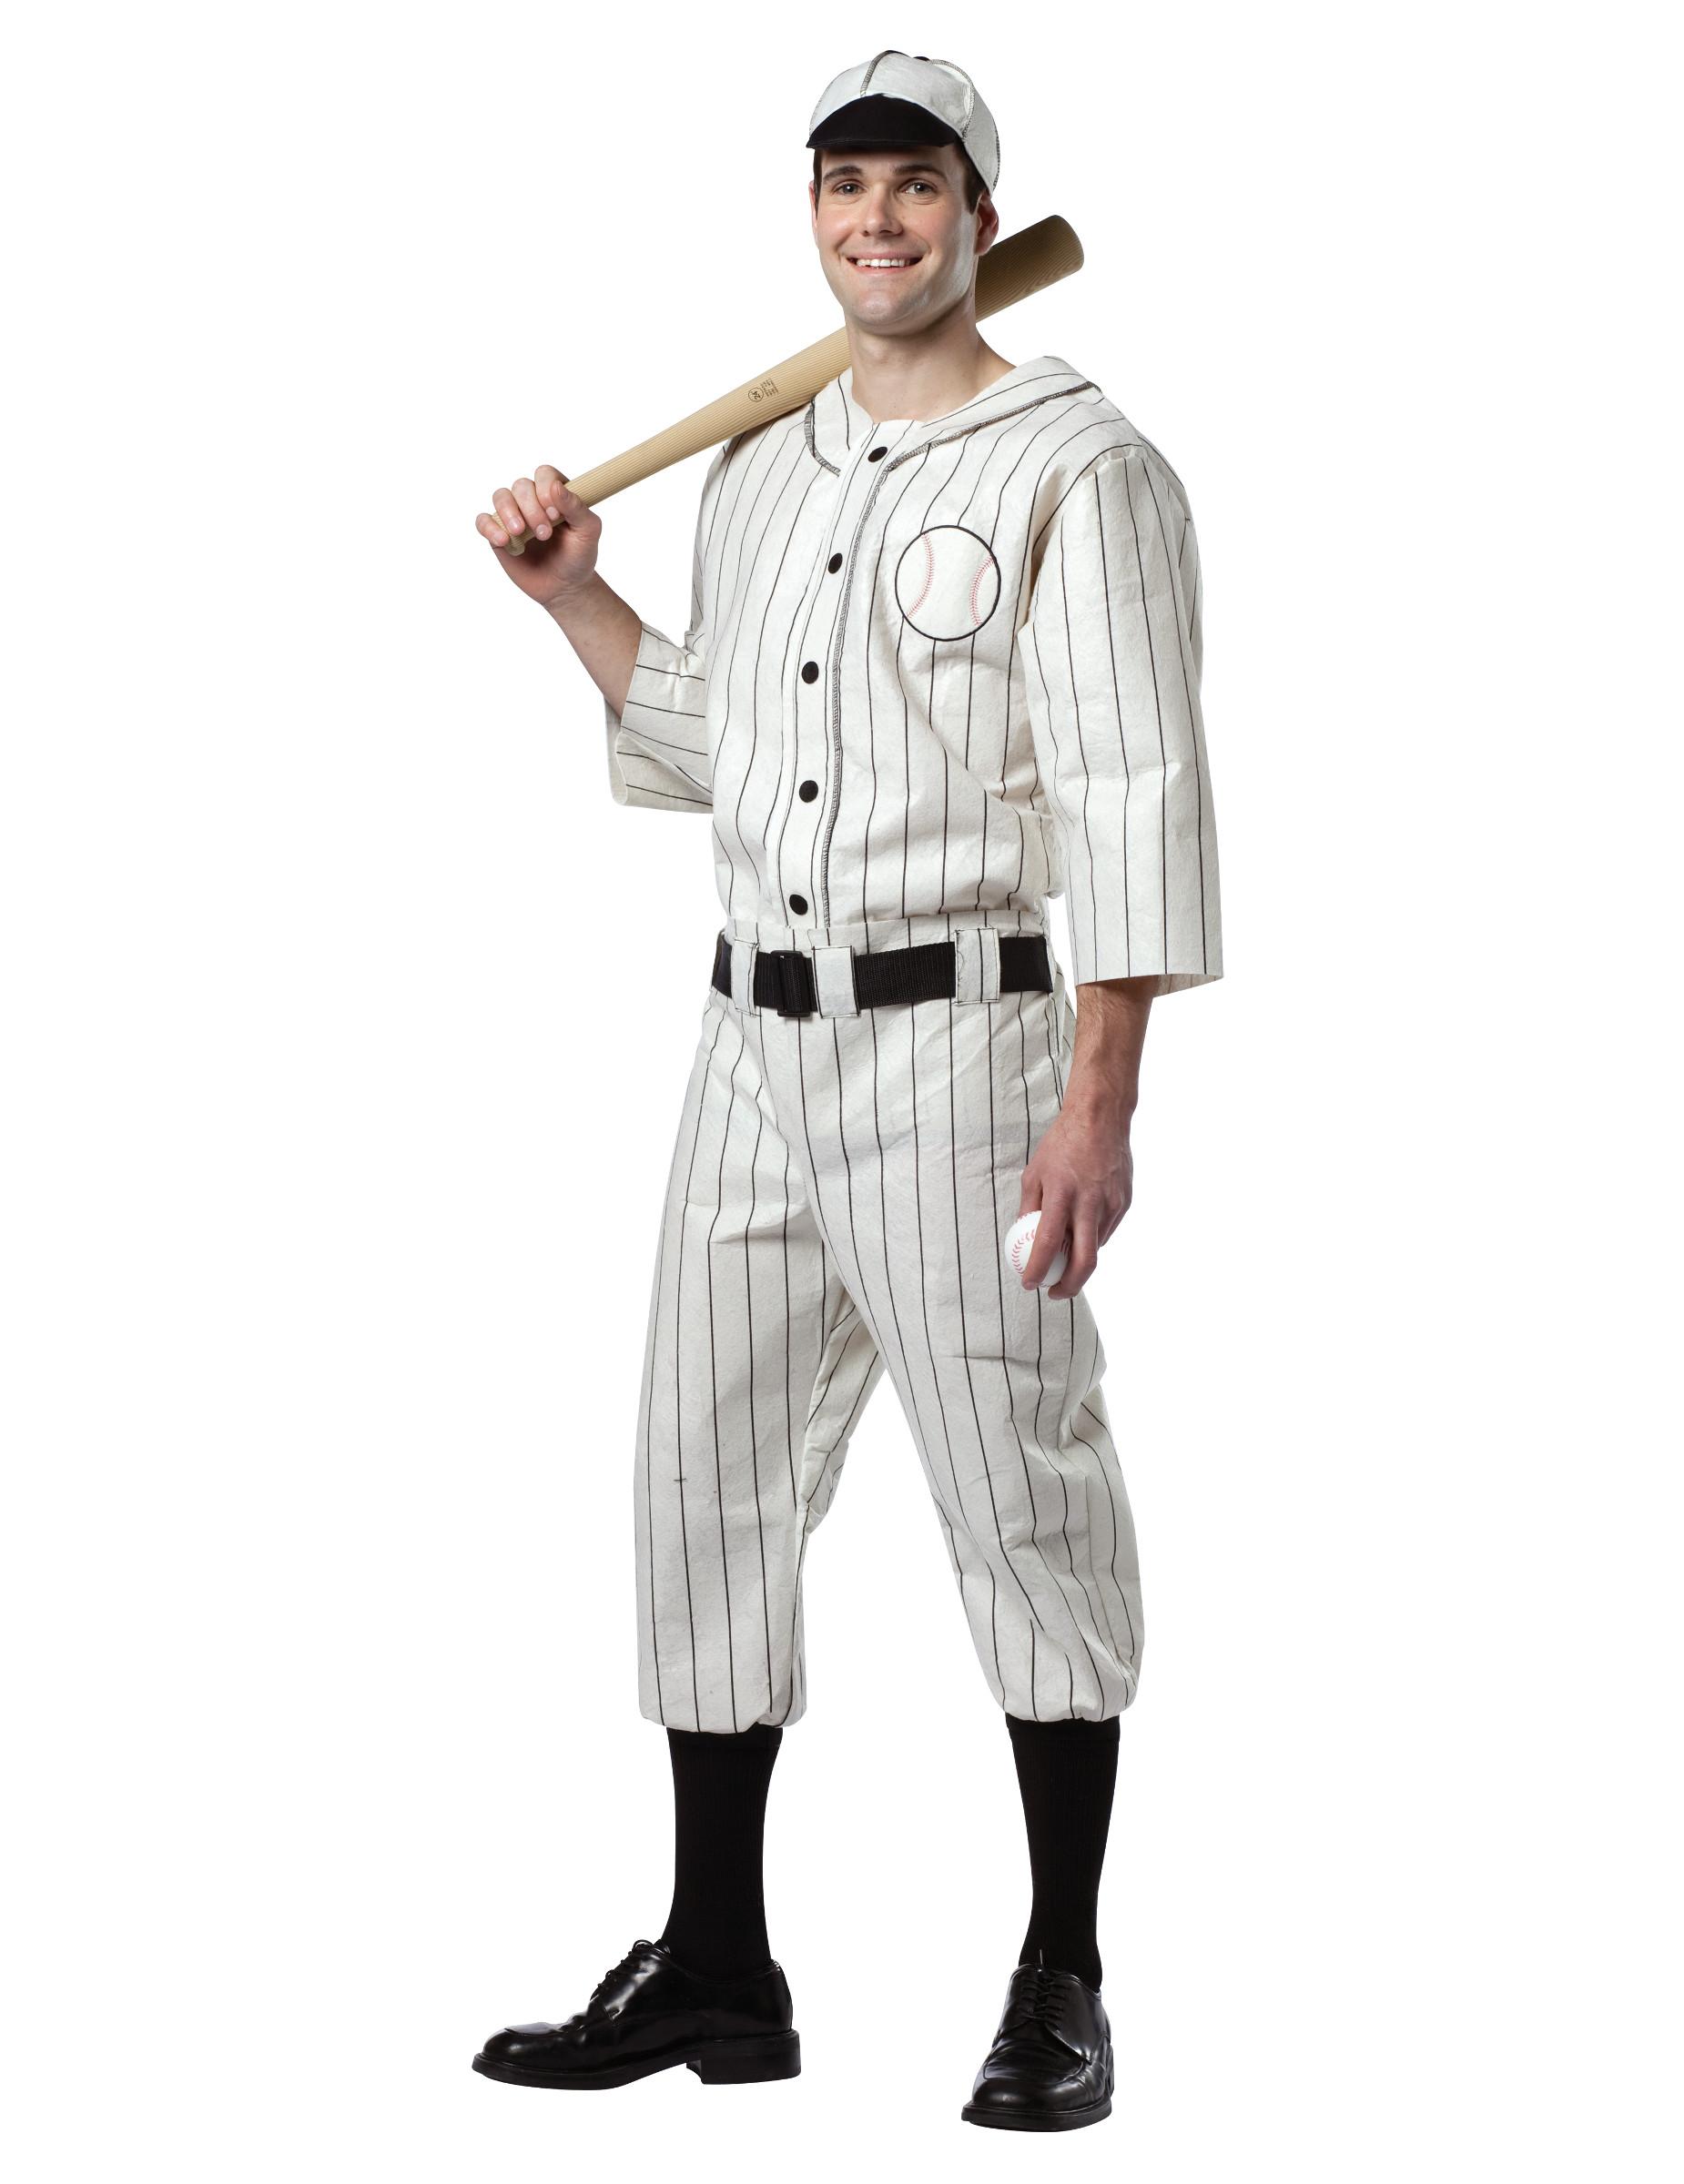 Erfreut Baseball Hochzeit Bevorzugt Ideen Zeitgenössisch ...